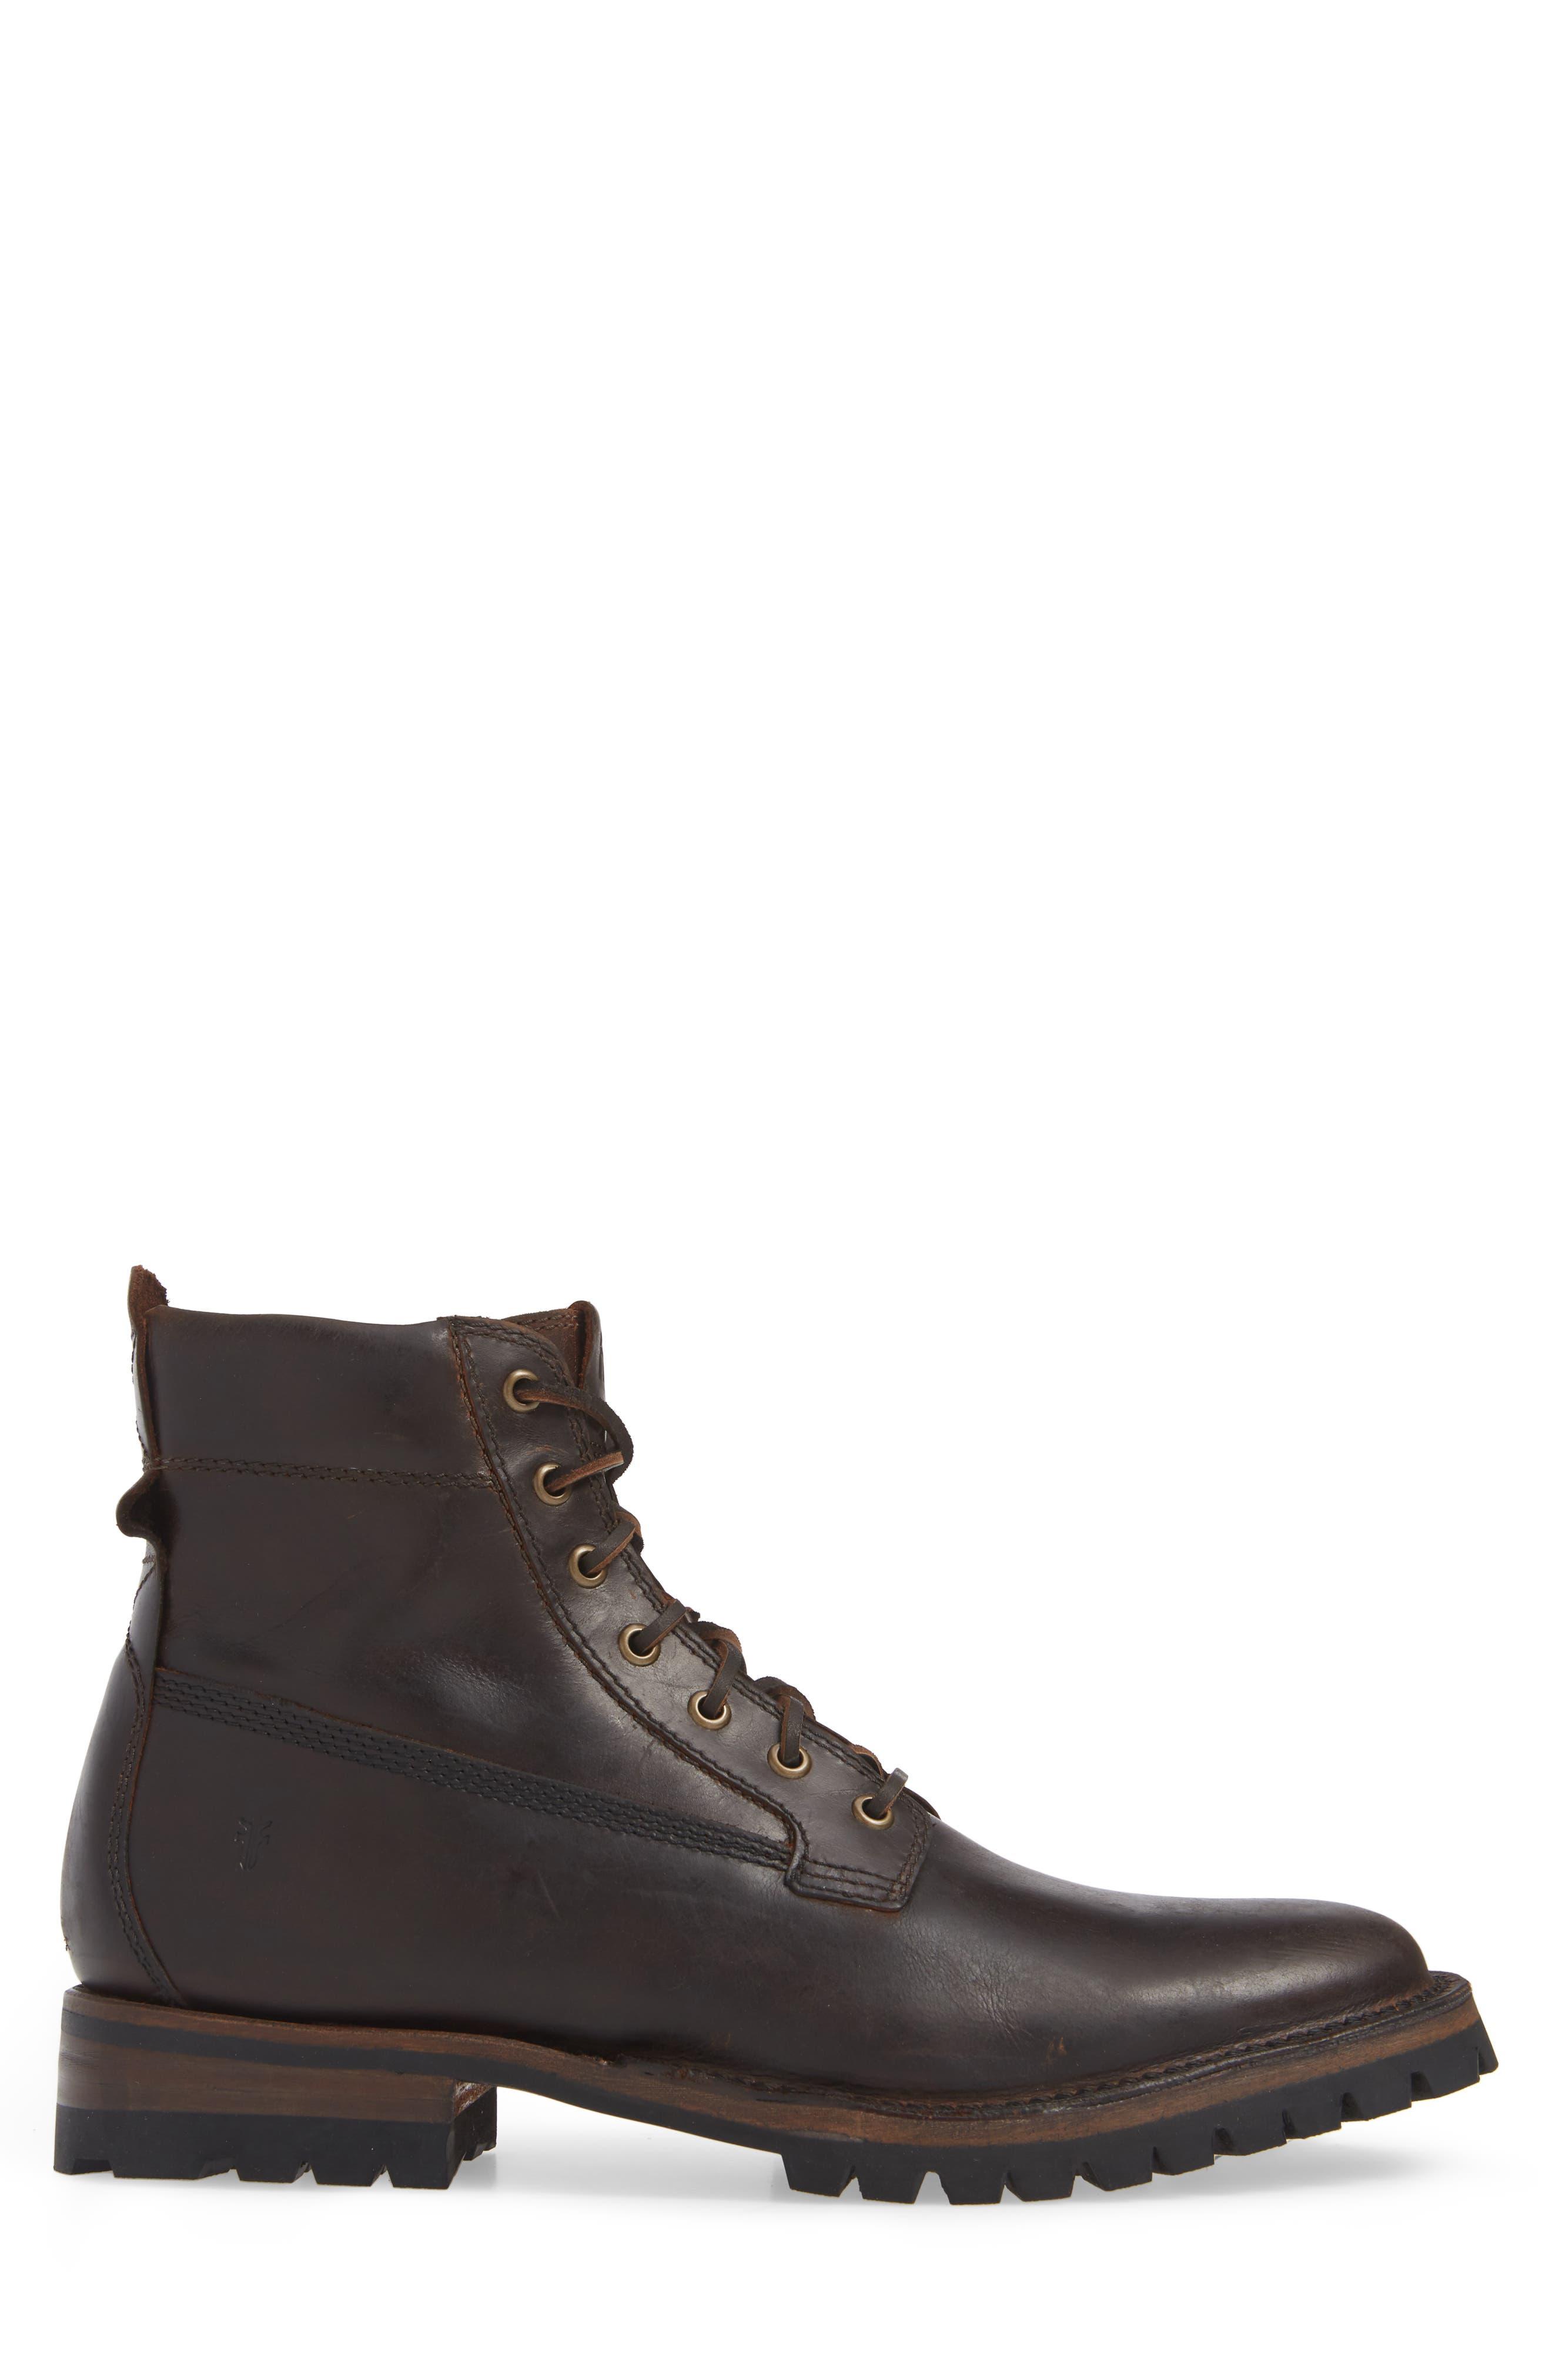 Union Plain Toe Boot,                             Alternate thumbnail 3, color,                             DARK BROWN